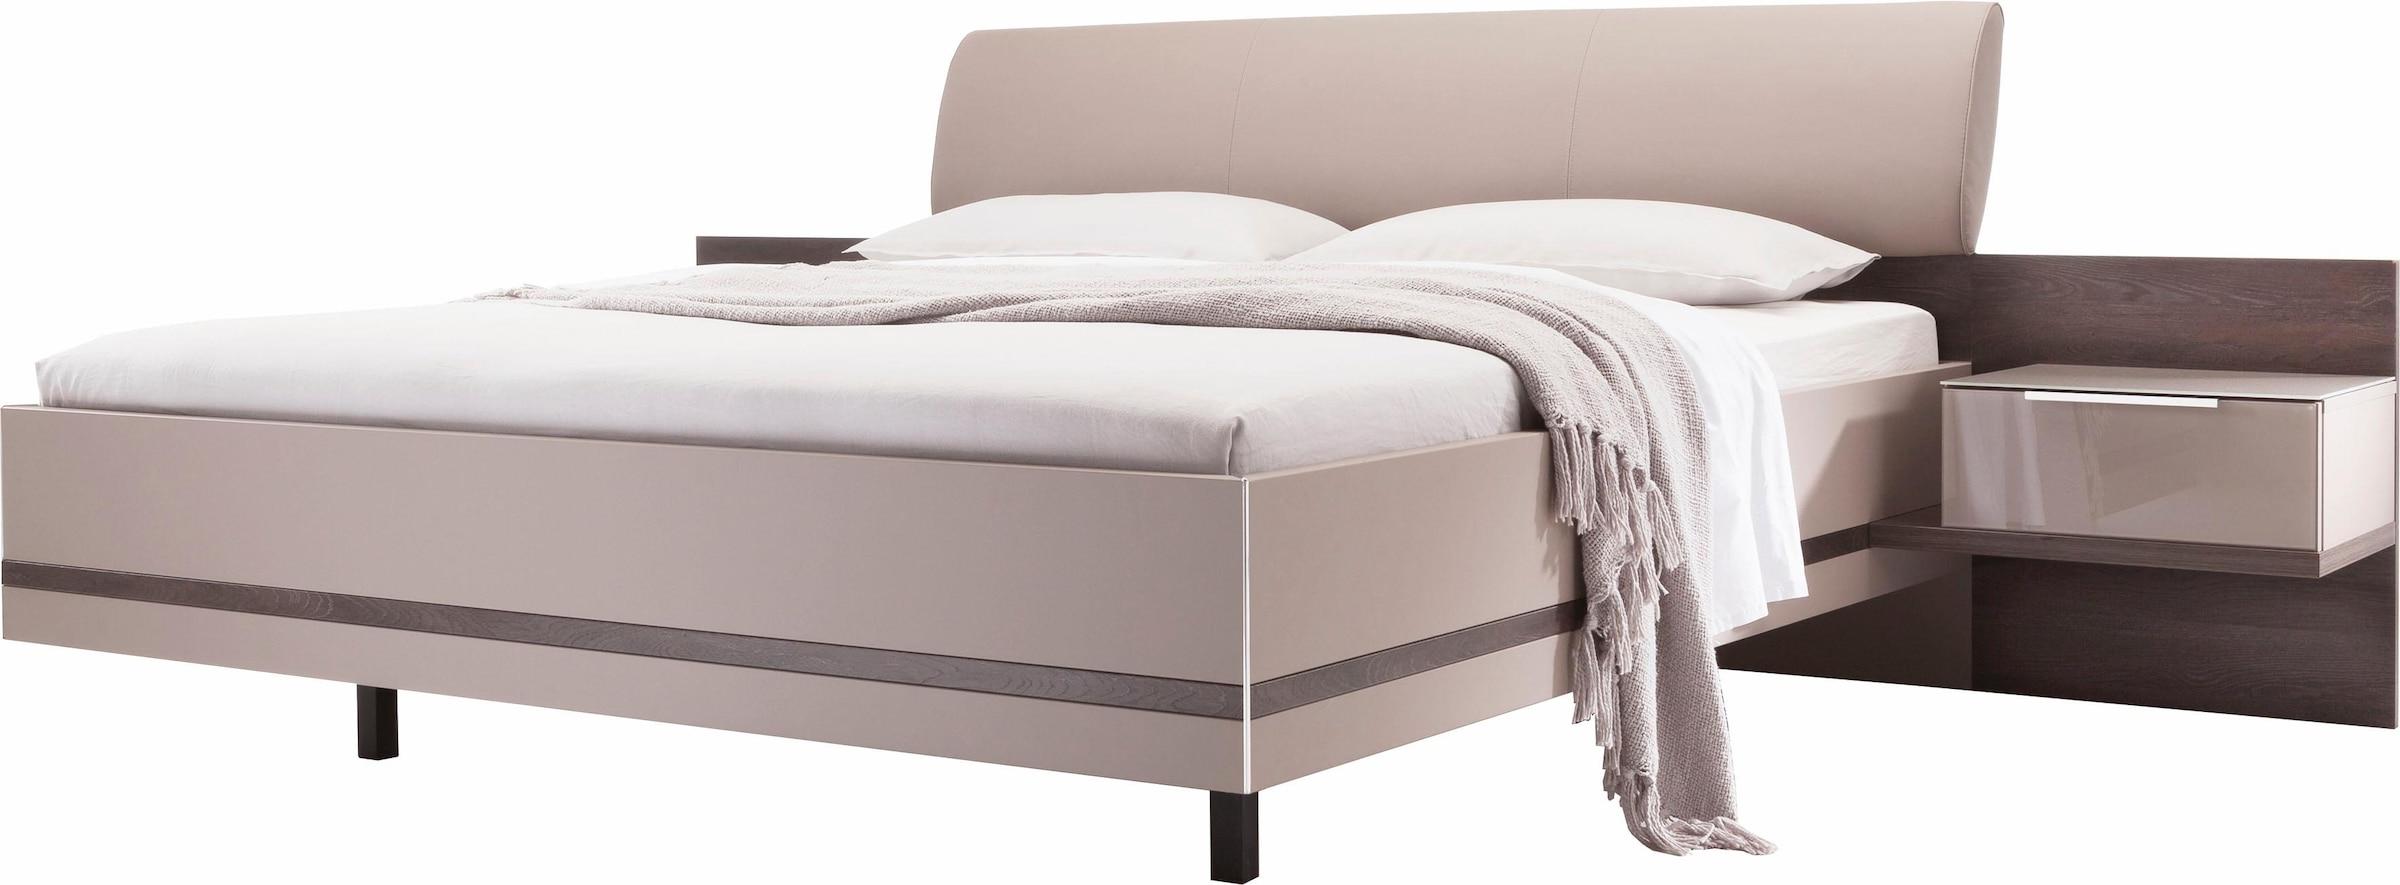 Image of nolte® Möbel Bettanlage »Concept me 500A«